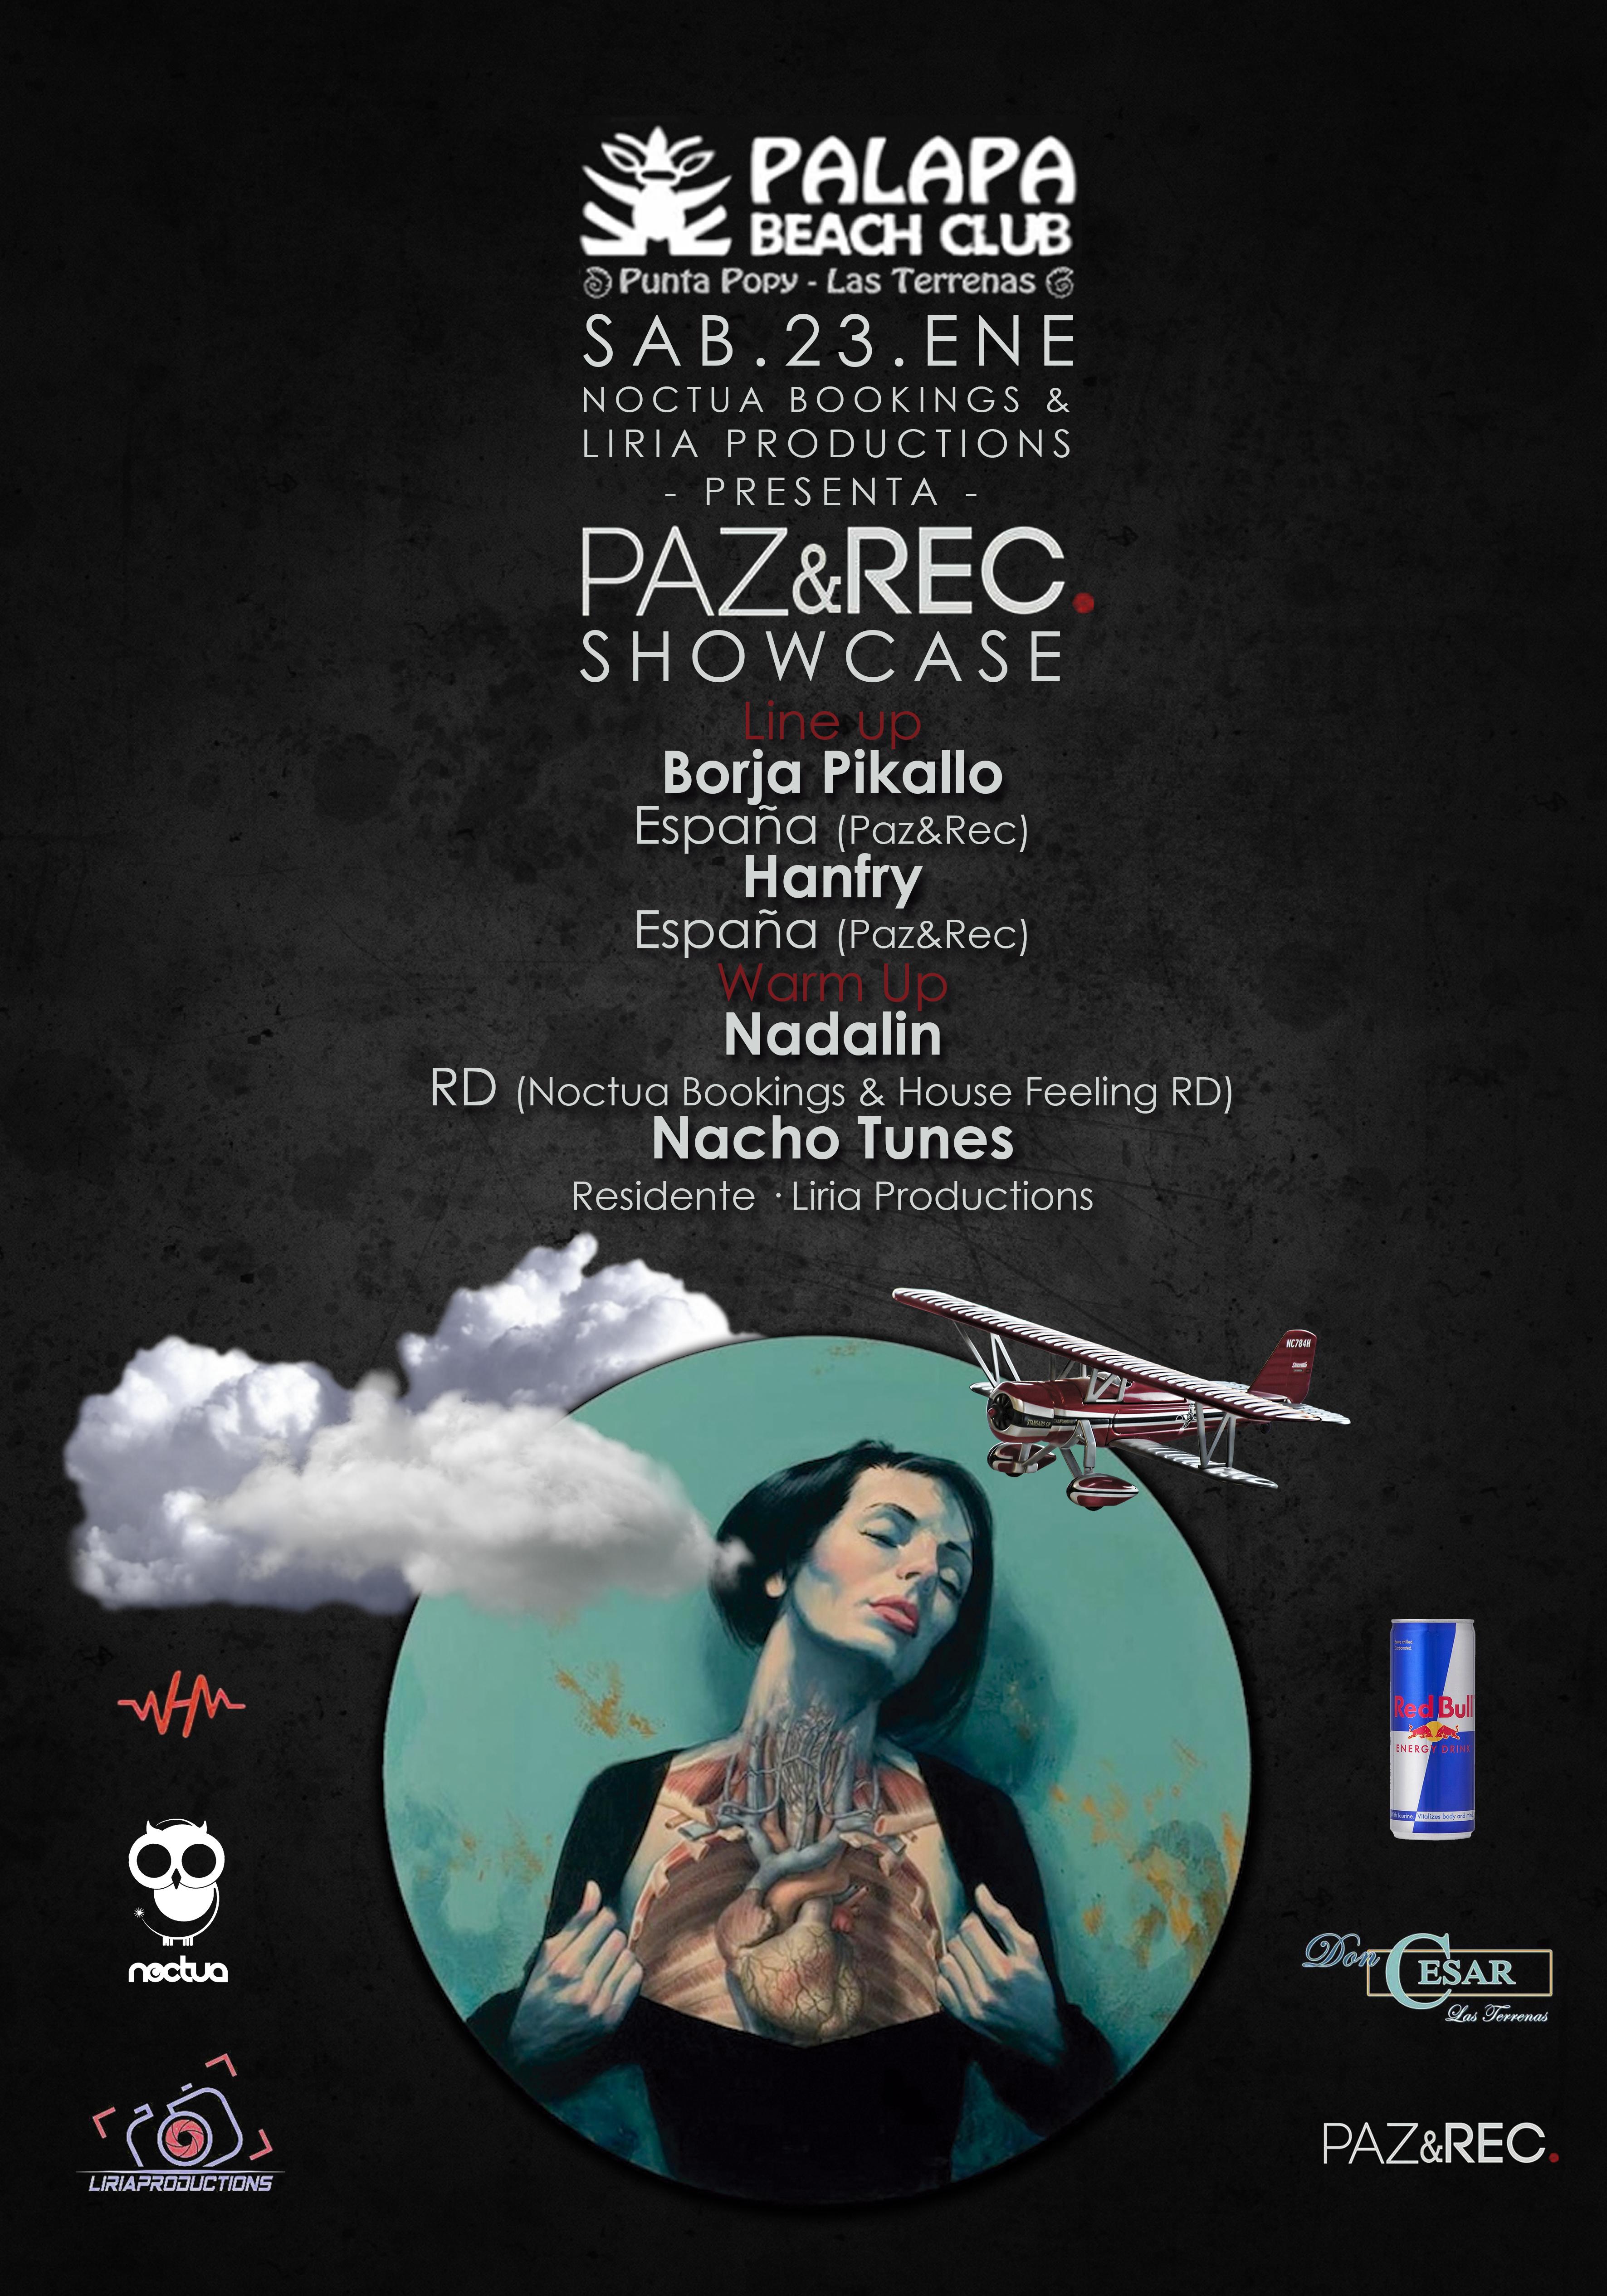 Paz&Rec Showcase República Dominicana